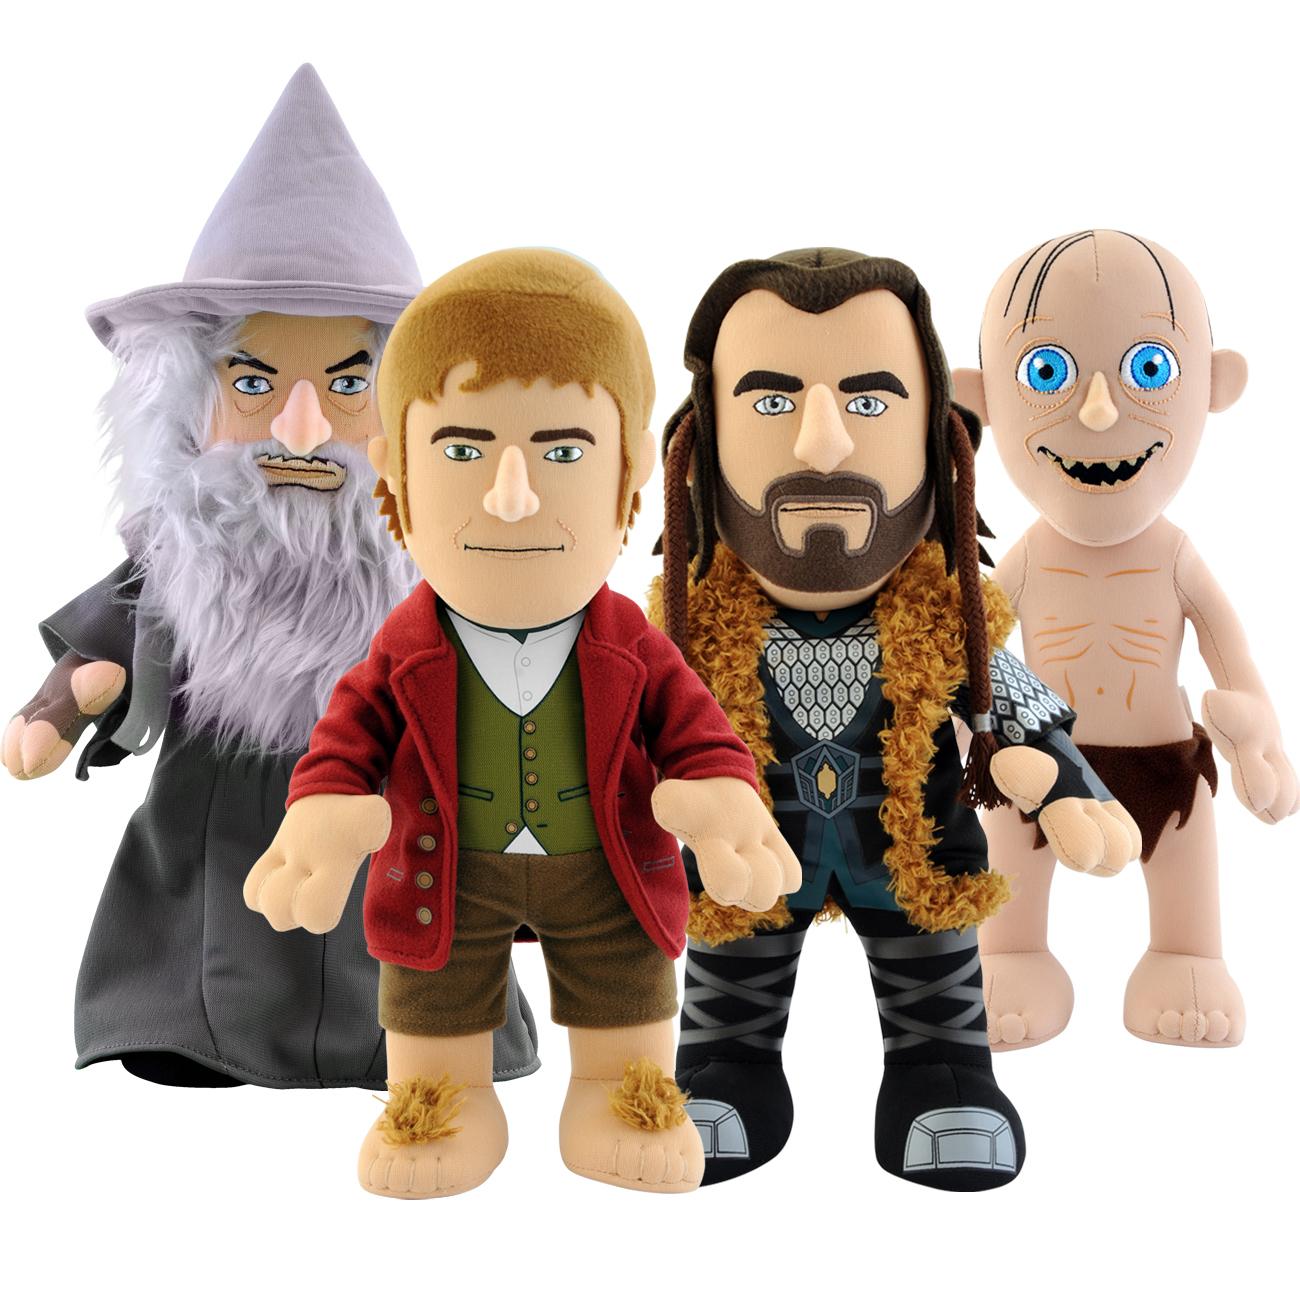 "Bleacher Creatures 10""The Hobbit Bilbo Bolseiro Boneca De Pelúcia-Novo"